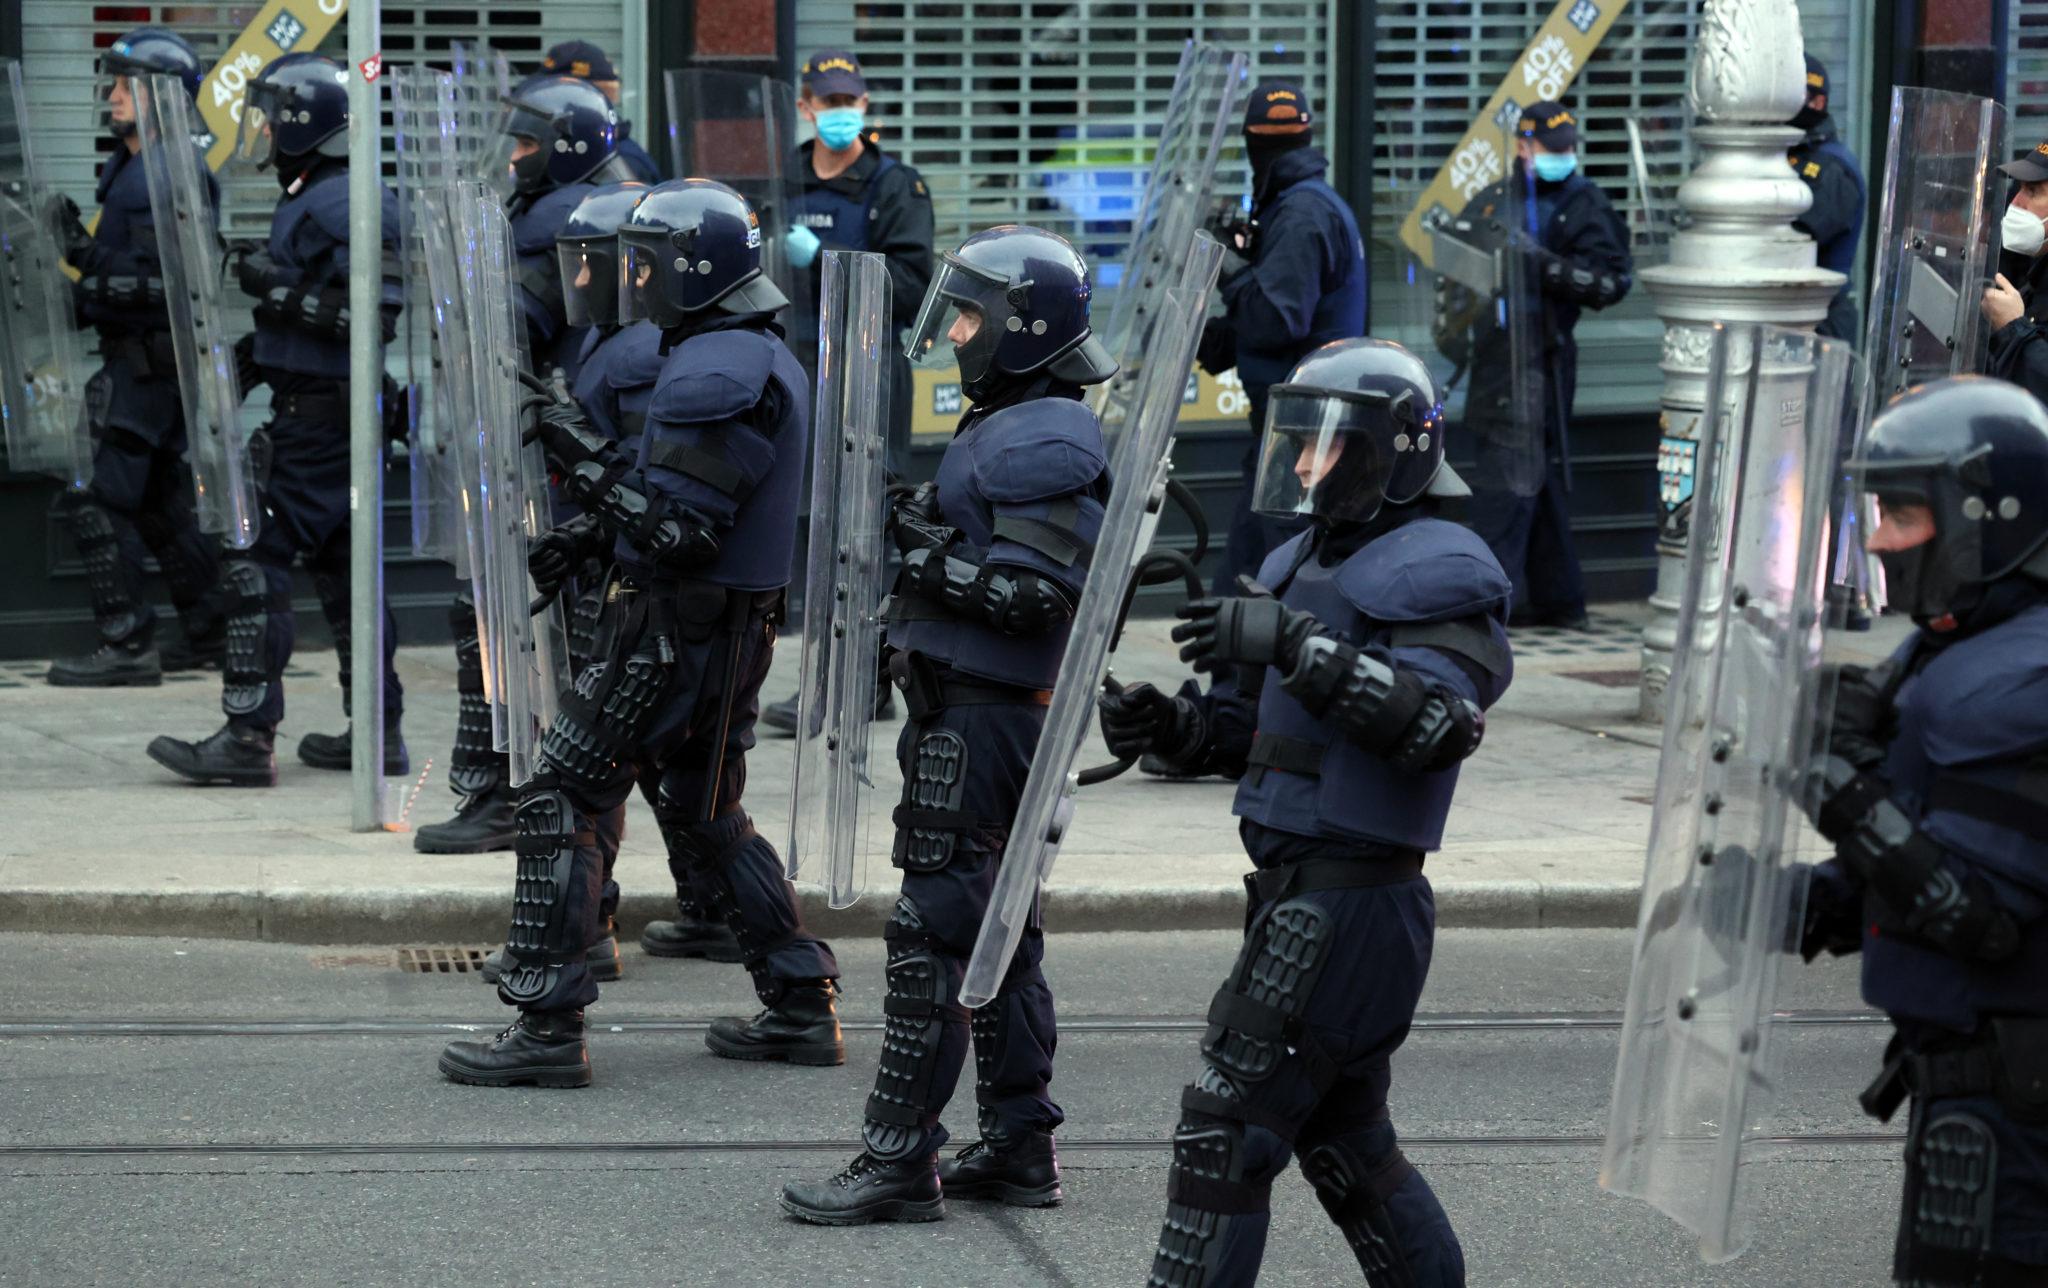 Members of the An Garda Siochana Public Order unit wearing riot gear and shields on Dawson Street in Dublin city